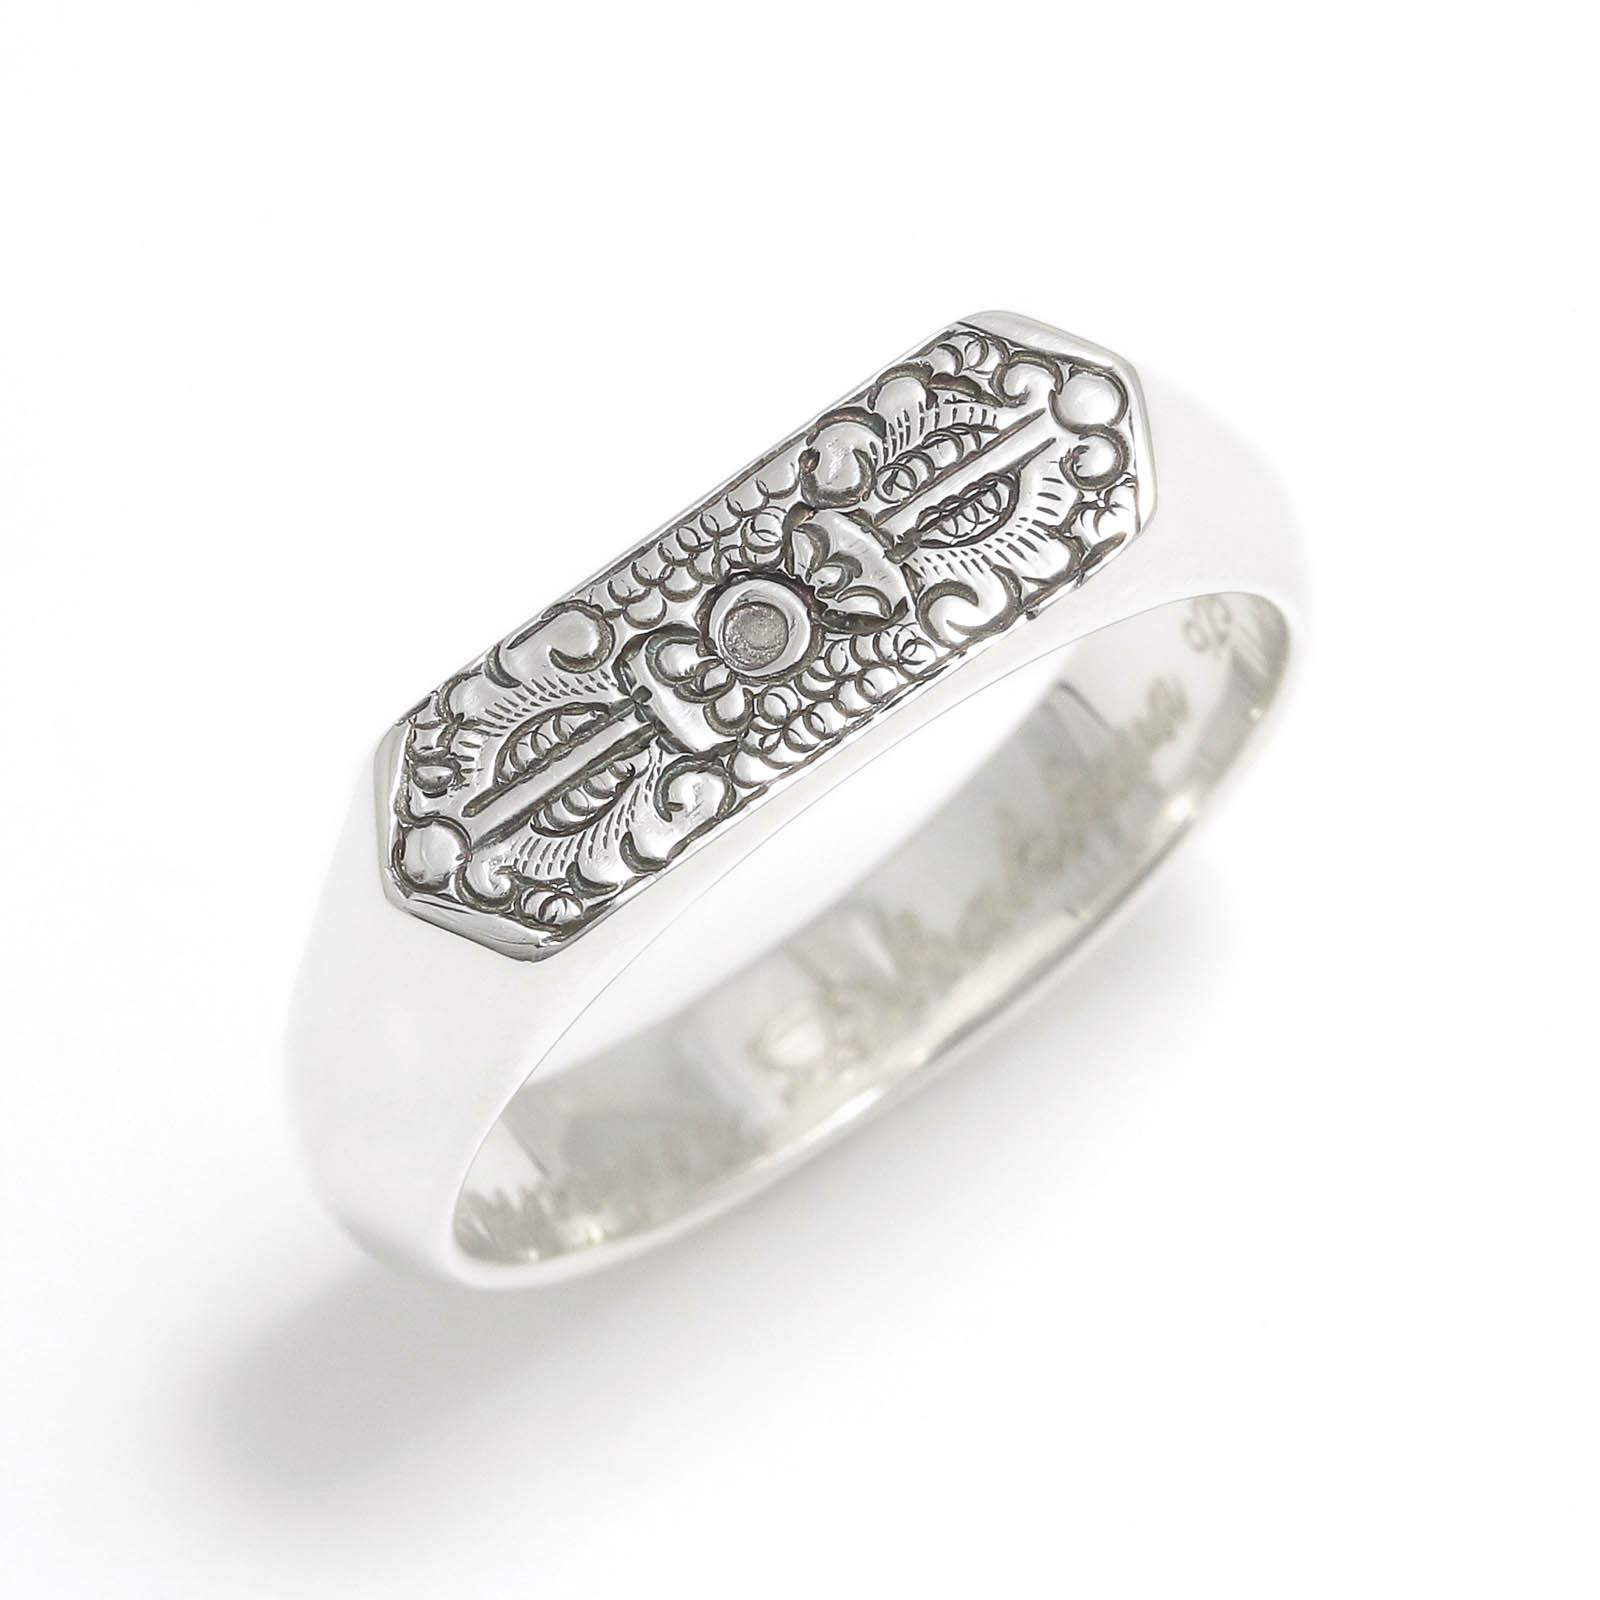 Narrow Dorje Carved Signet Ring